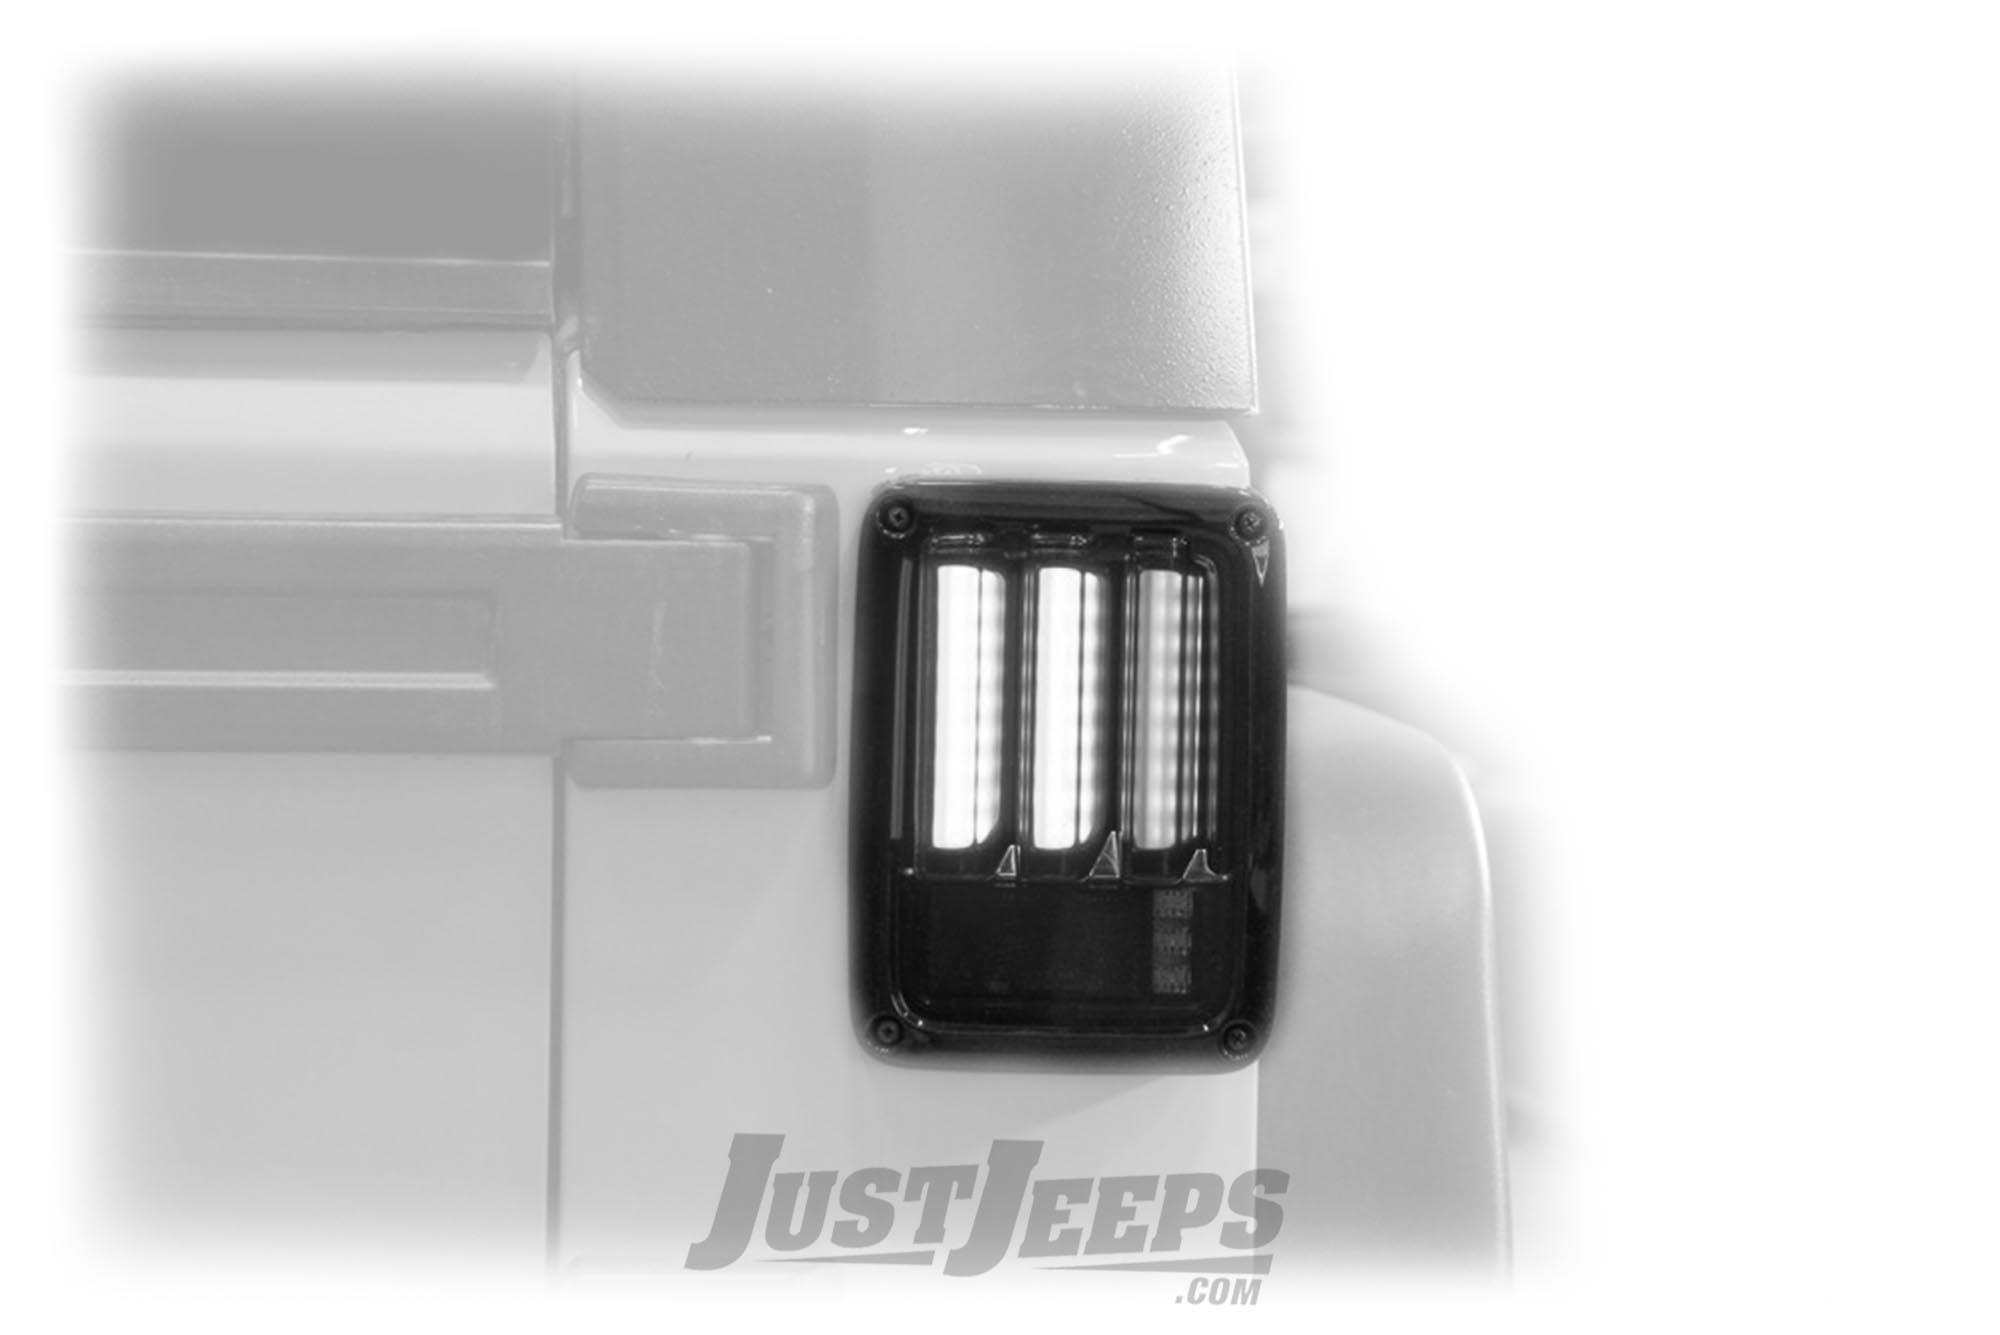 Spyder Automotive Sequential Fiber Optic LED Tail Lights For 2007-18 Jeep Wrangler JK 2 Door & Unlimited 4 Door Models